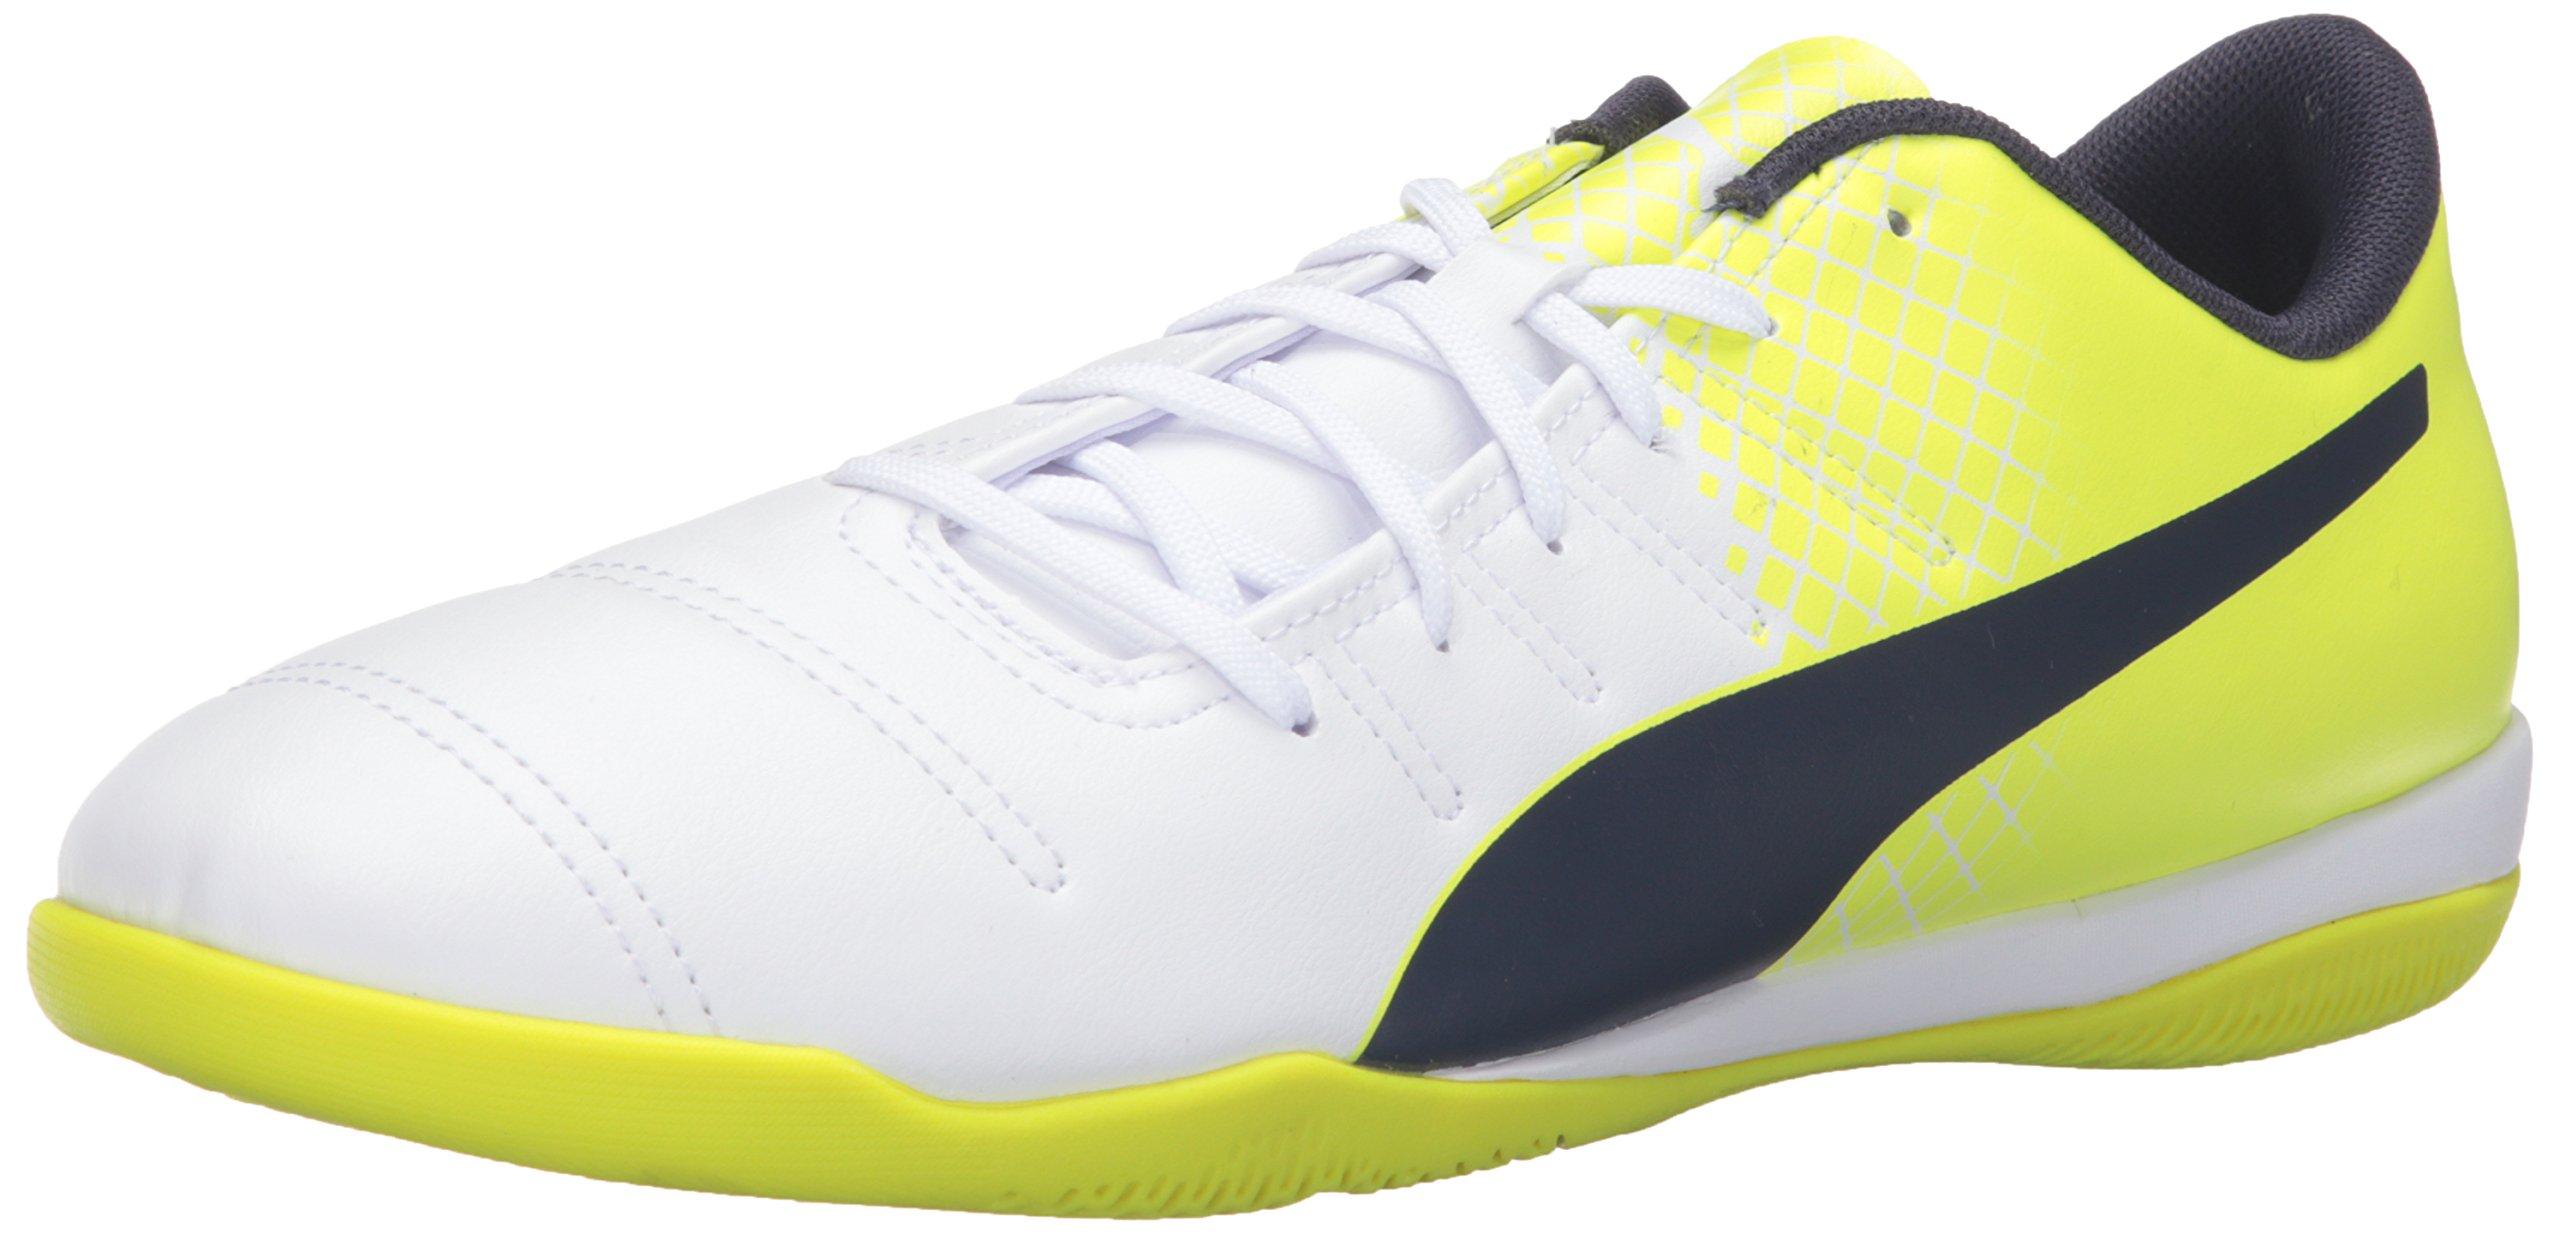 PUMA Men's Evopower 4.3 Tricks IT Soccer Shoe, White/Peacoat/S, 8.5 M US